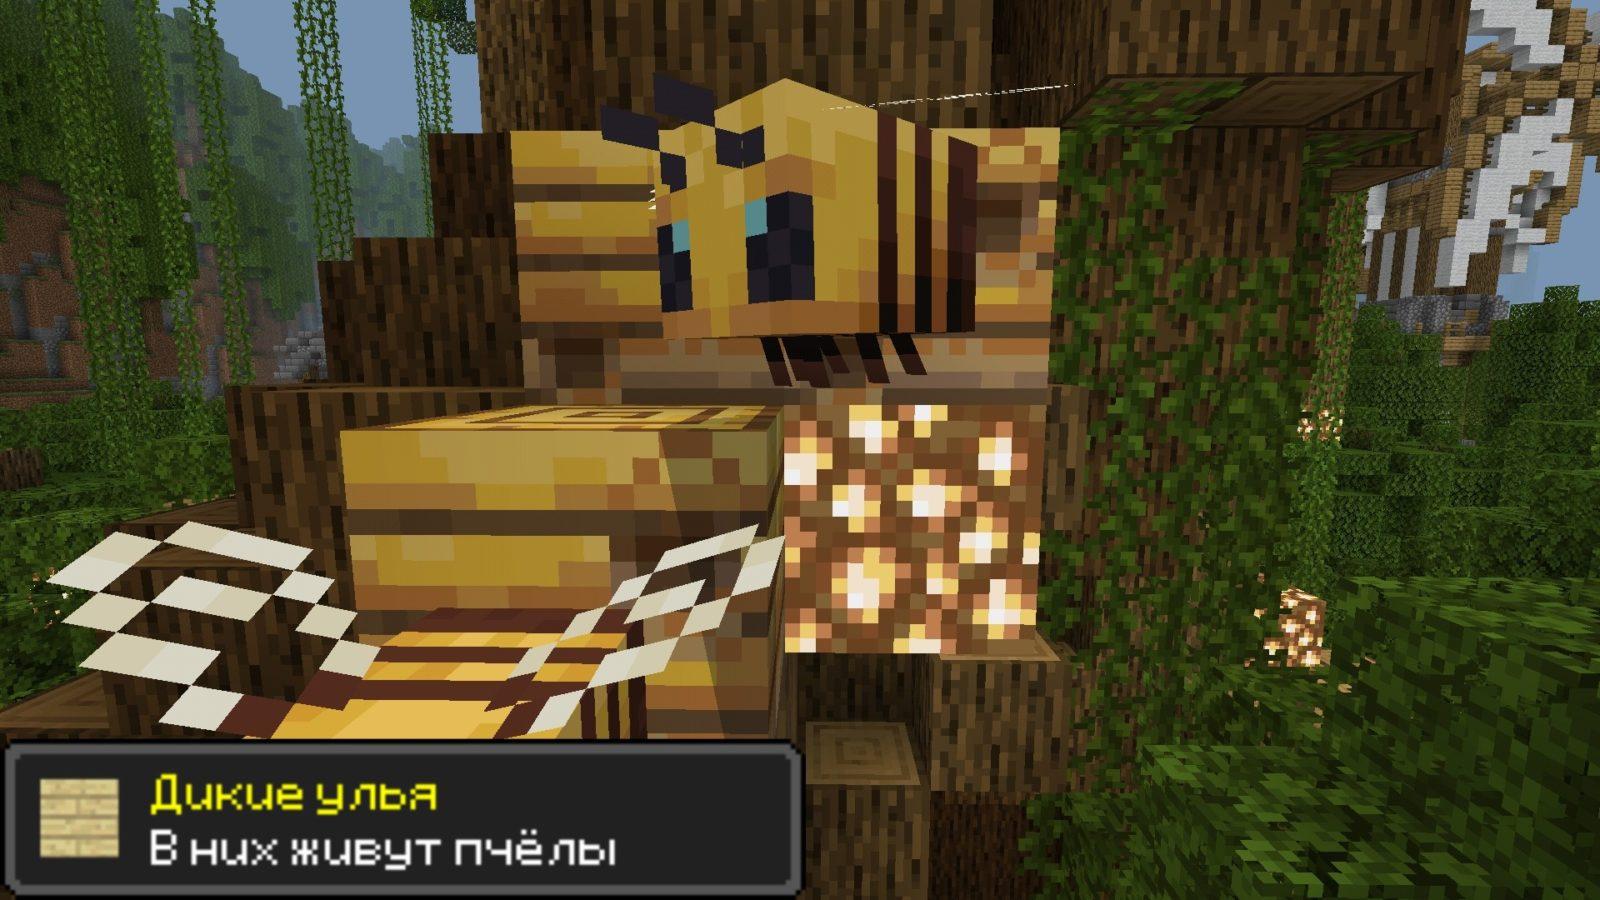 Dikie ylyia v Minecraft PE 1.14.25.1